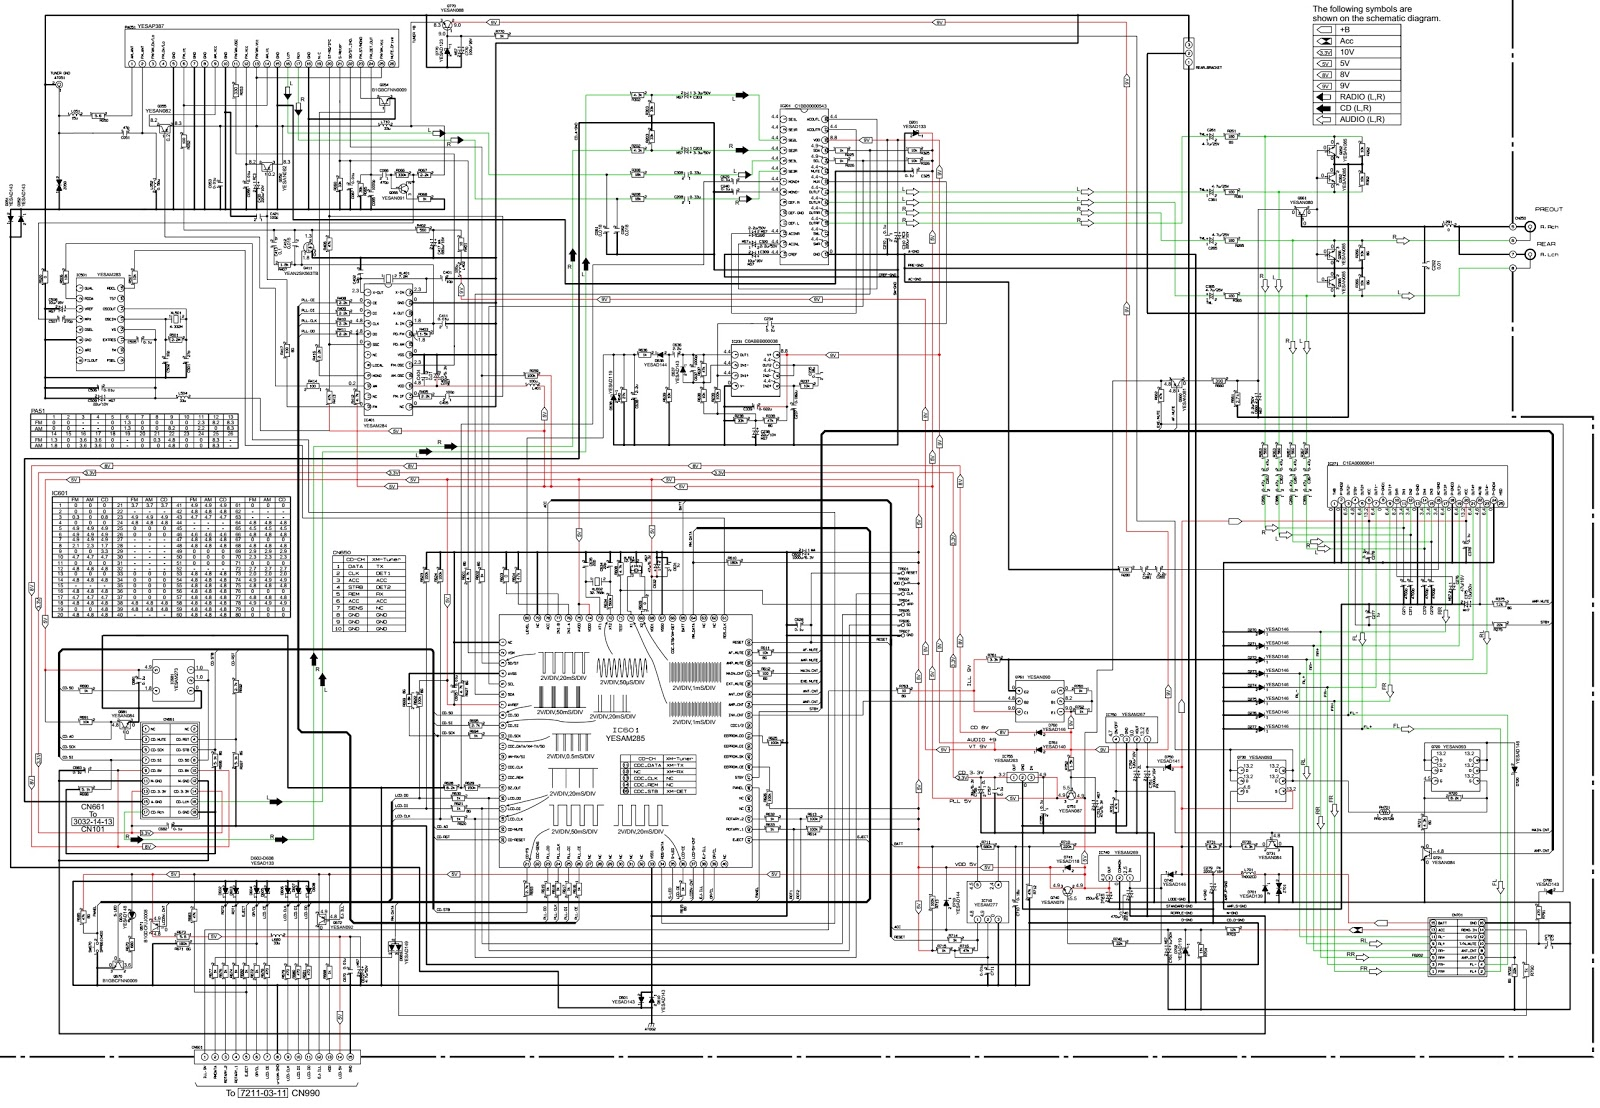 Panasonic Cq C N Circuit Diagram Exploded View